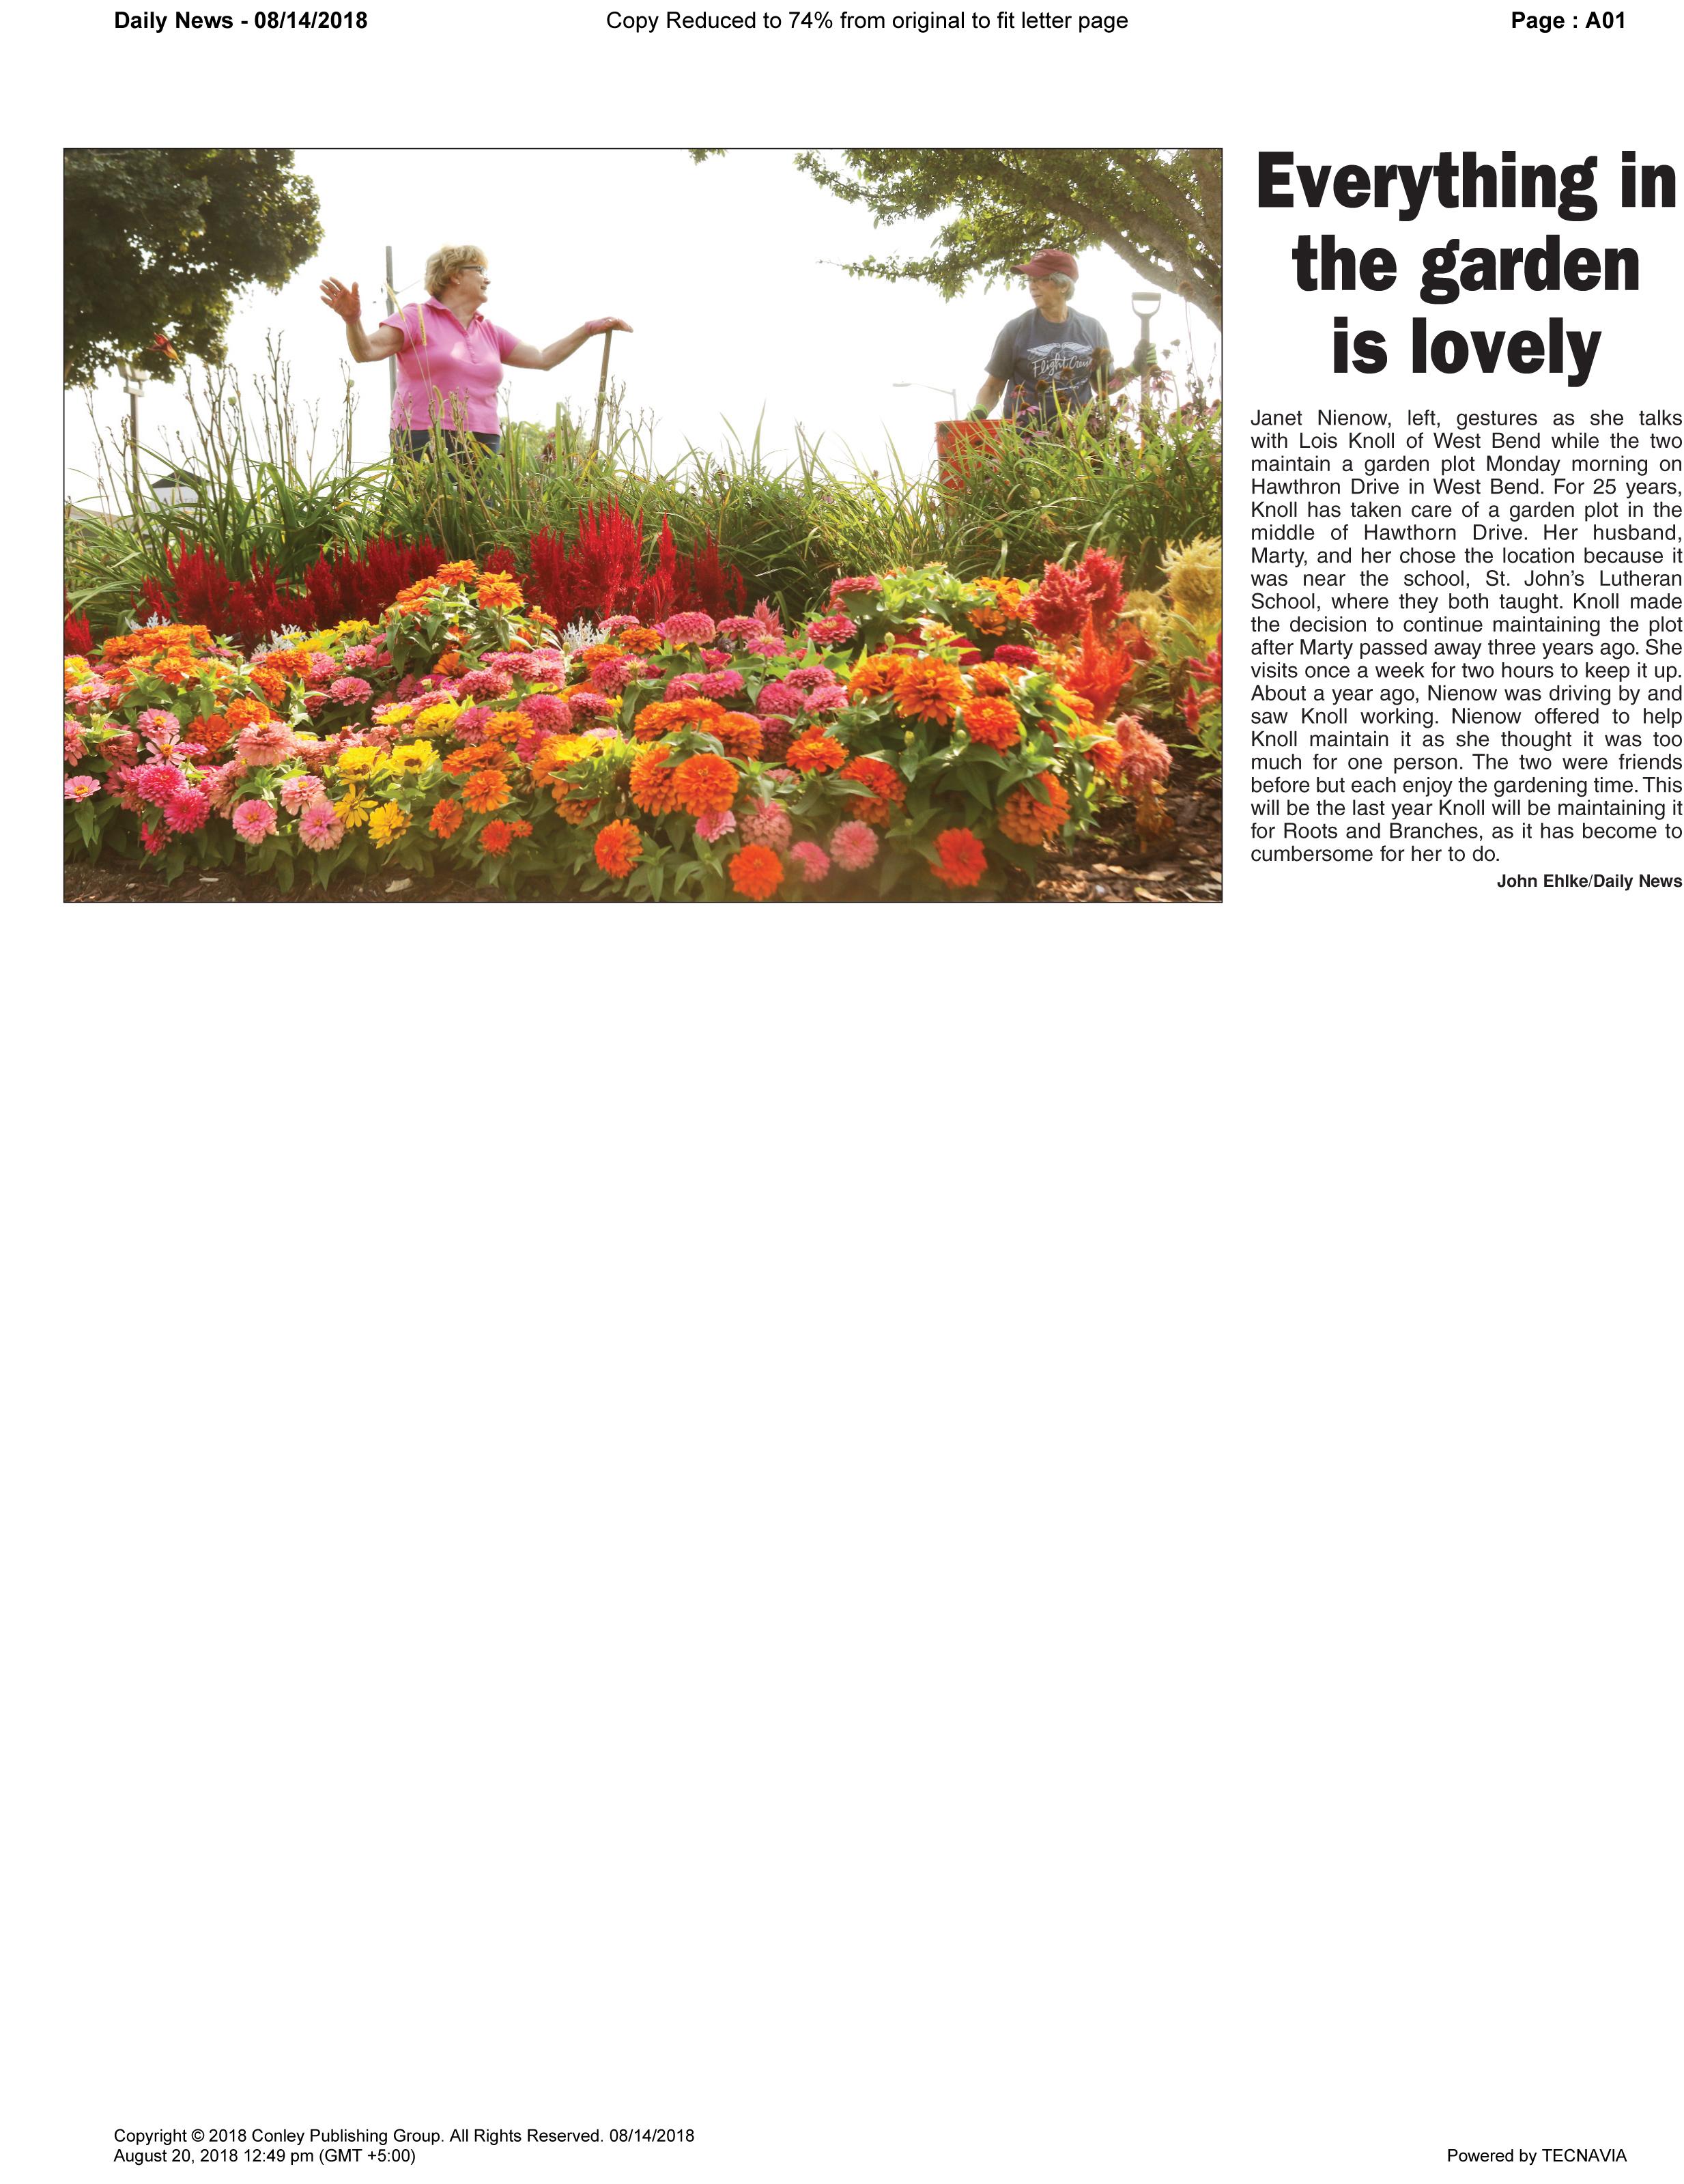 West_Bend_Daily_News_20180814_A01_1.jpg